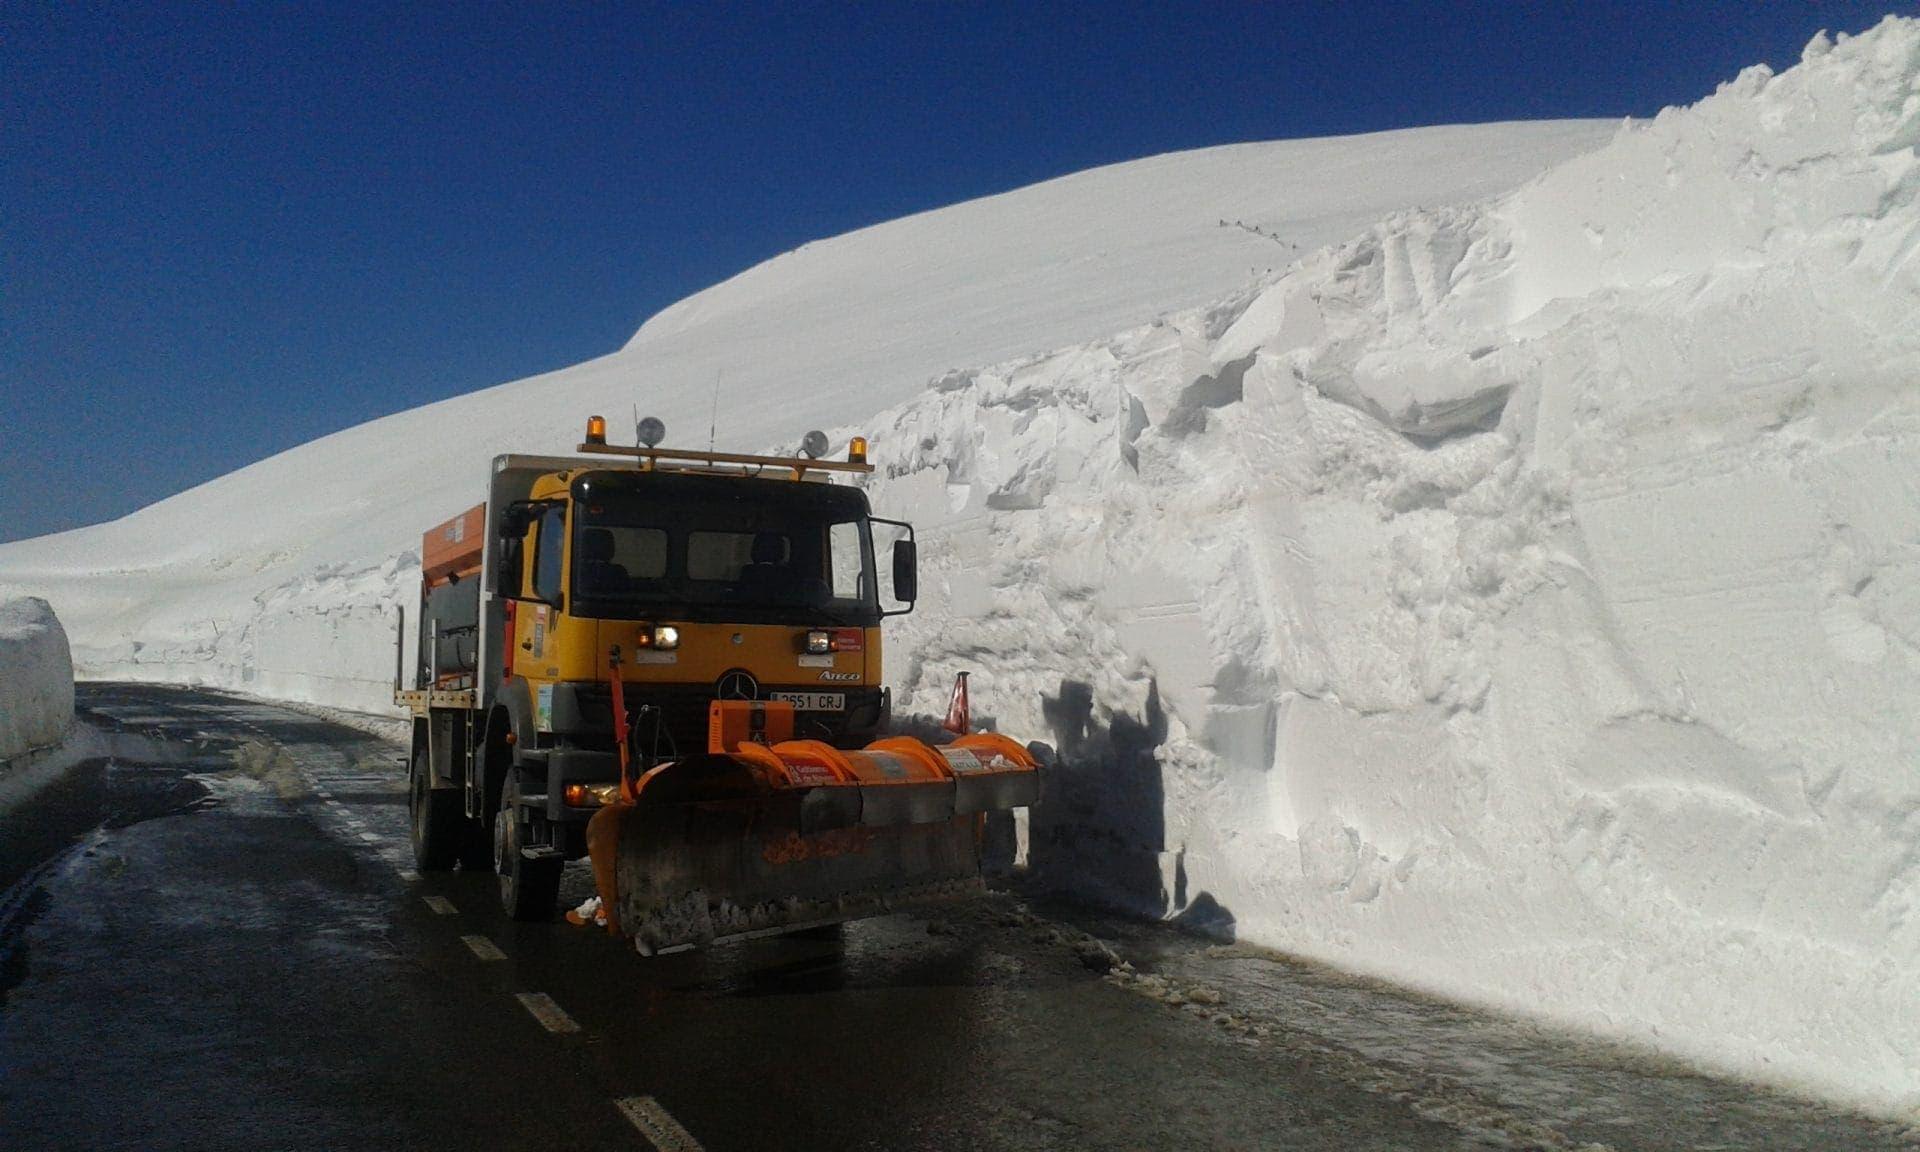 snowploughs road maintenance of snow winter